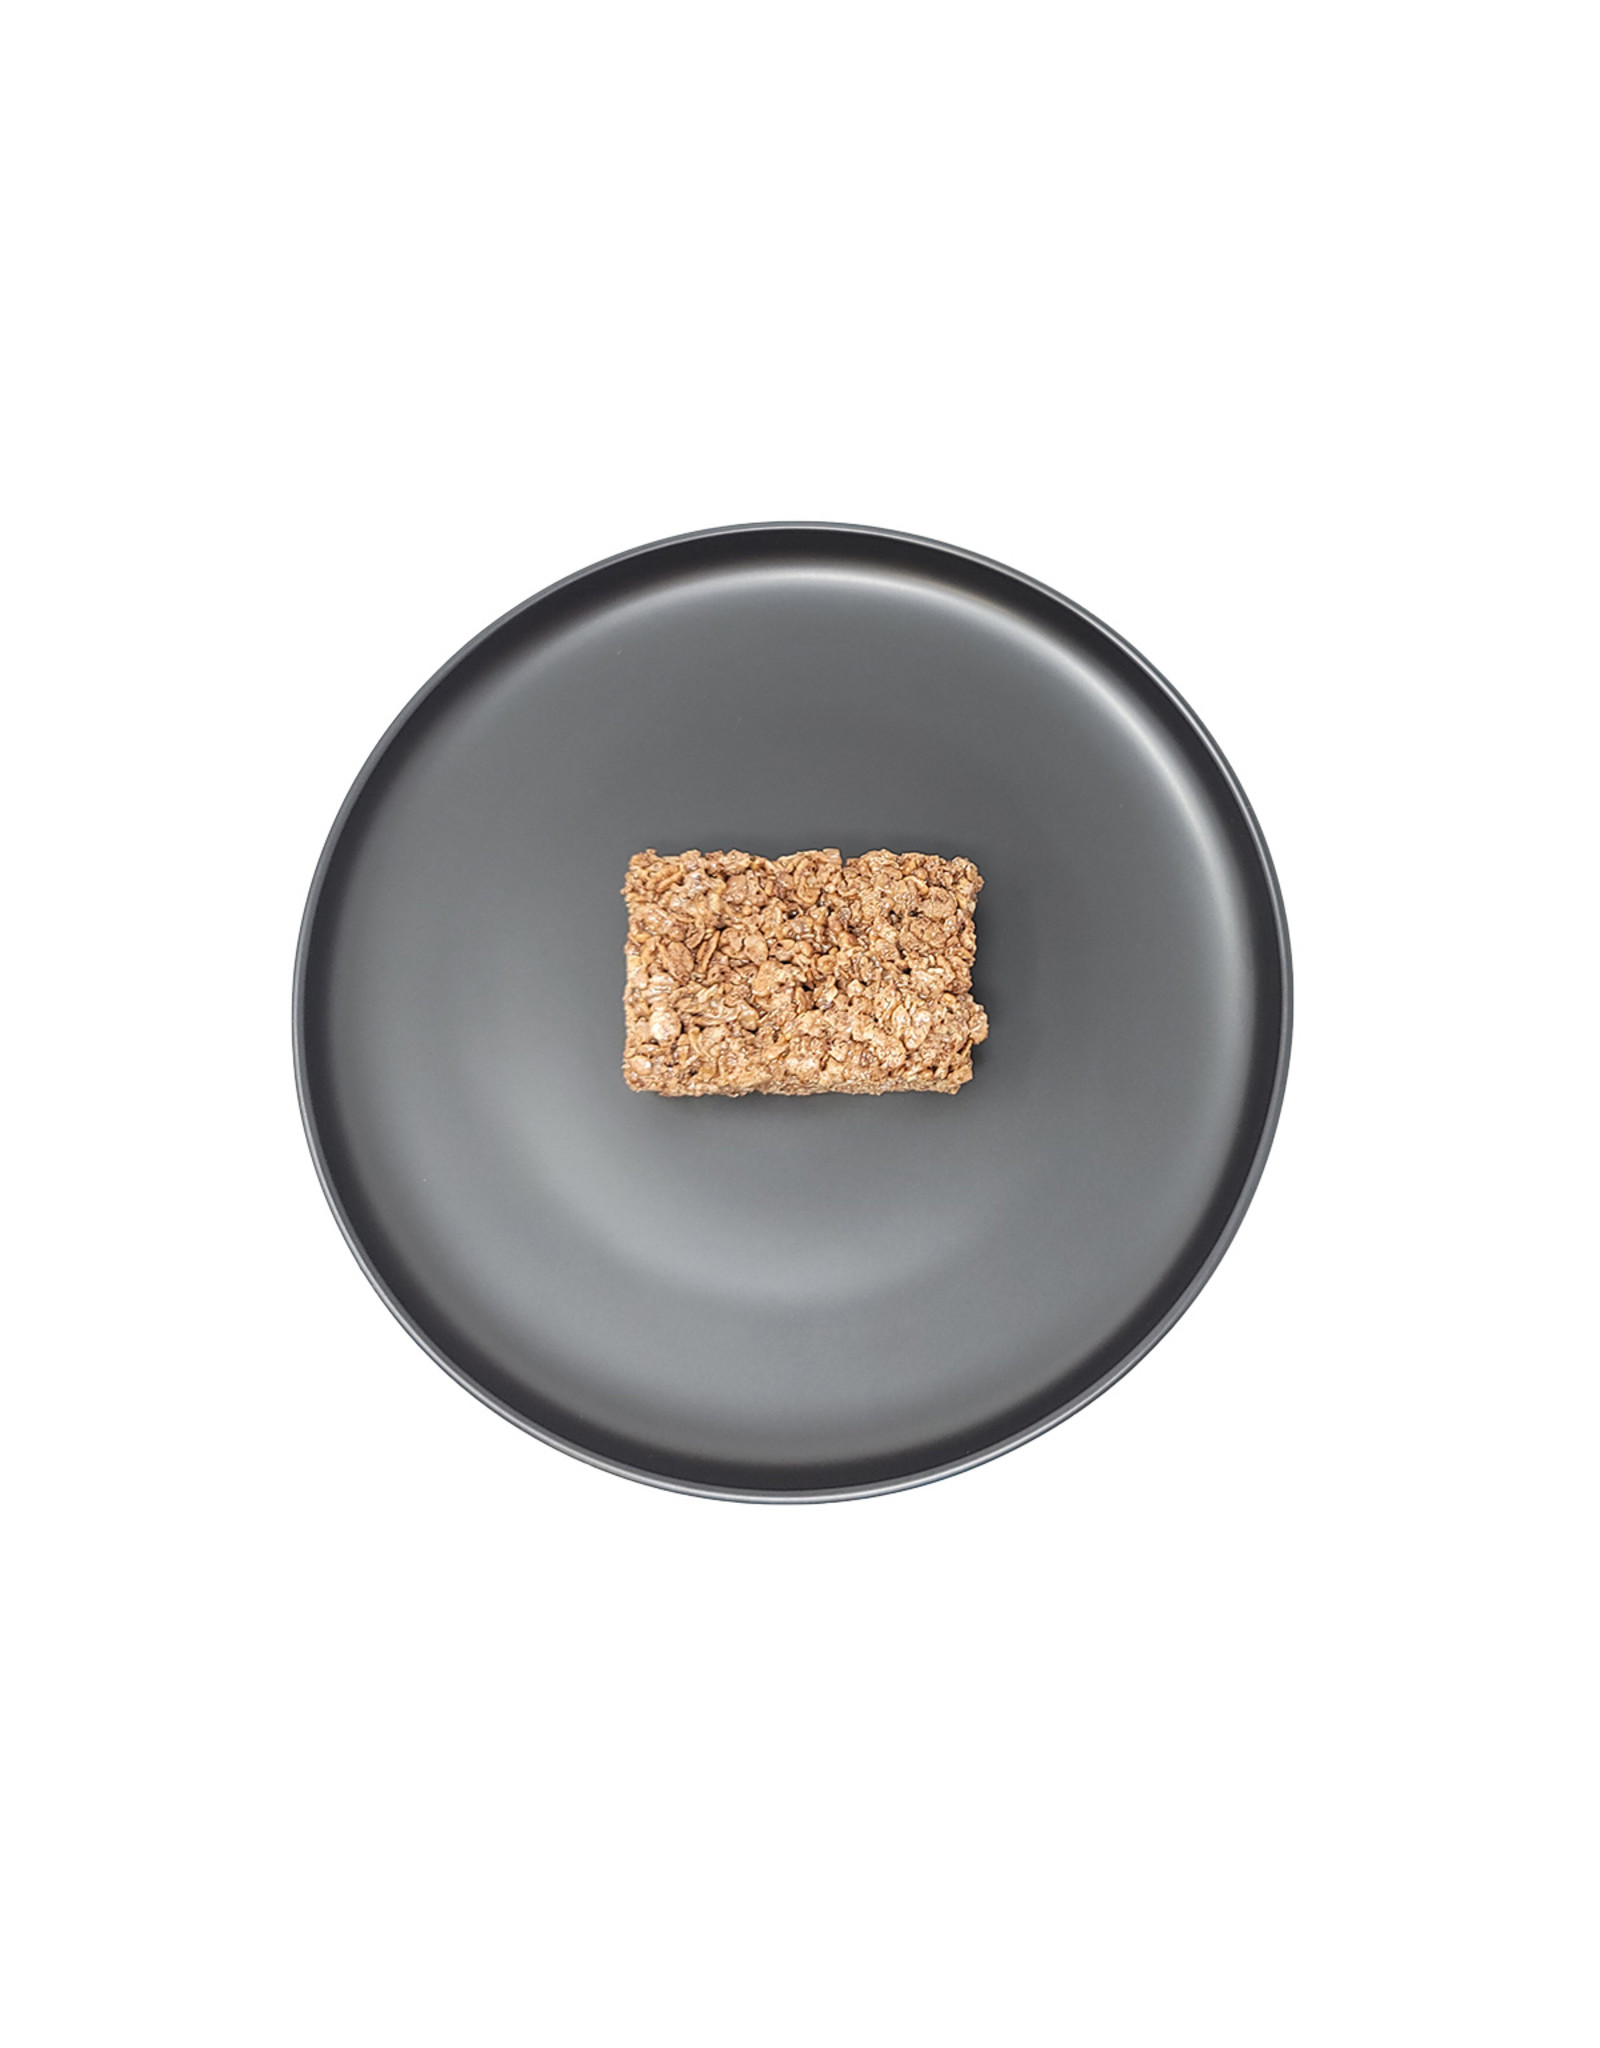 Snap dragon cocoa pebbles